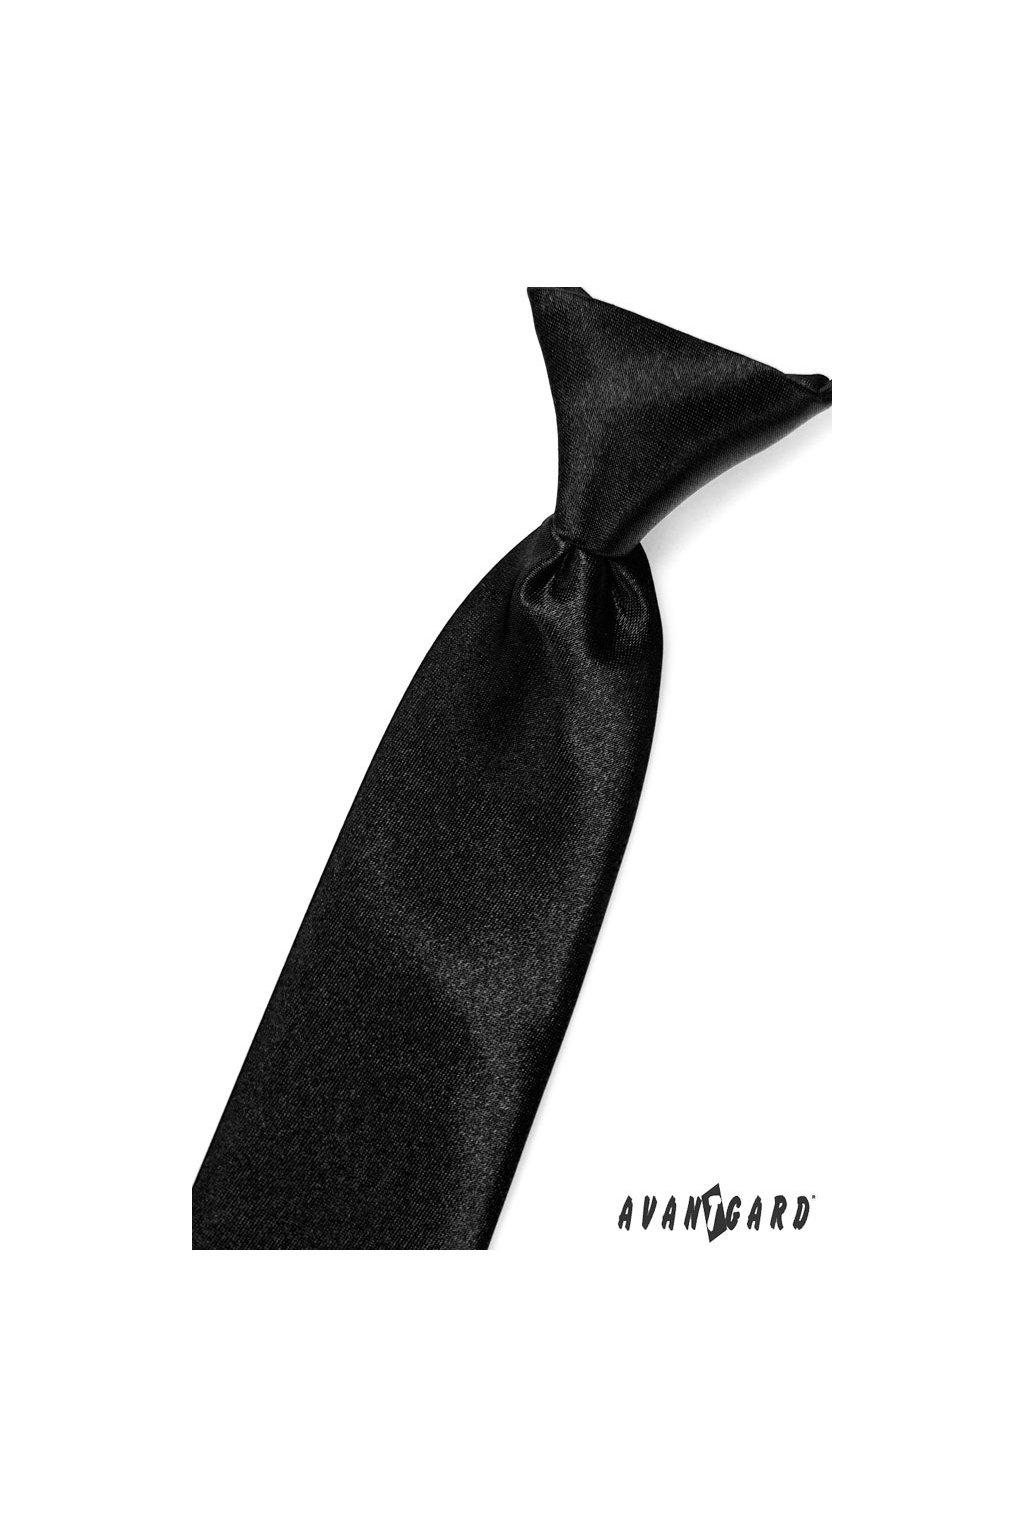 Chlapecká kravata černá 558 - 705